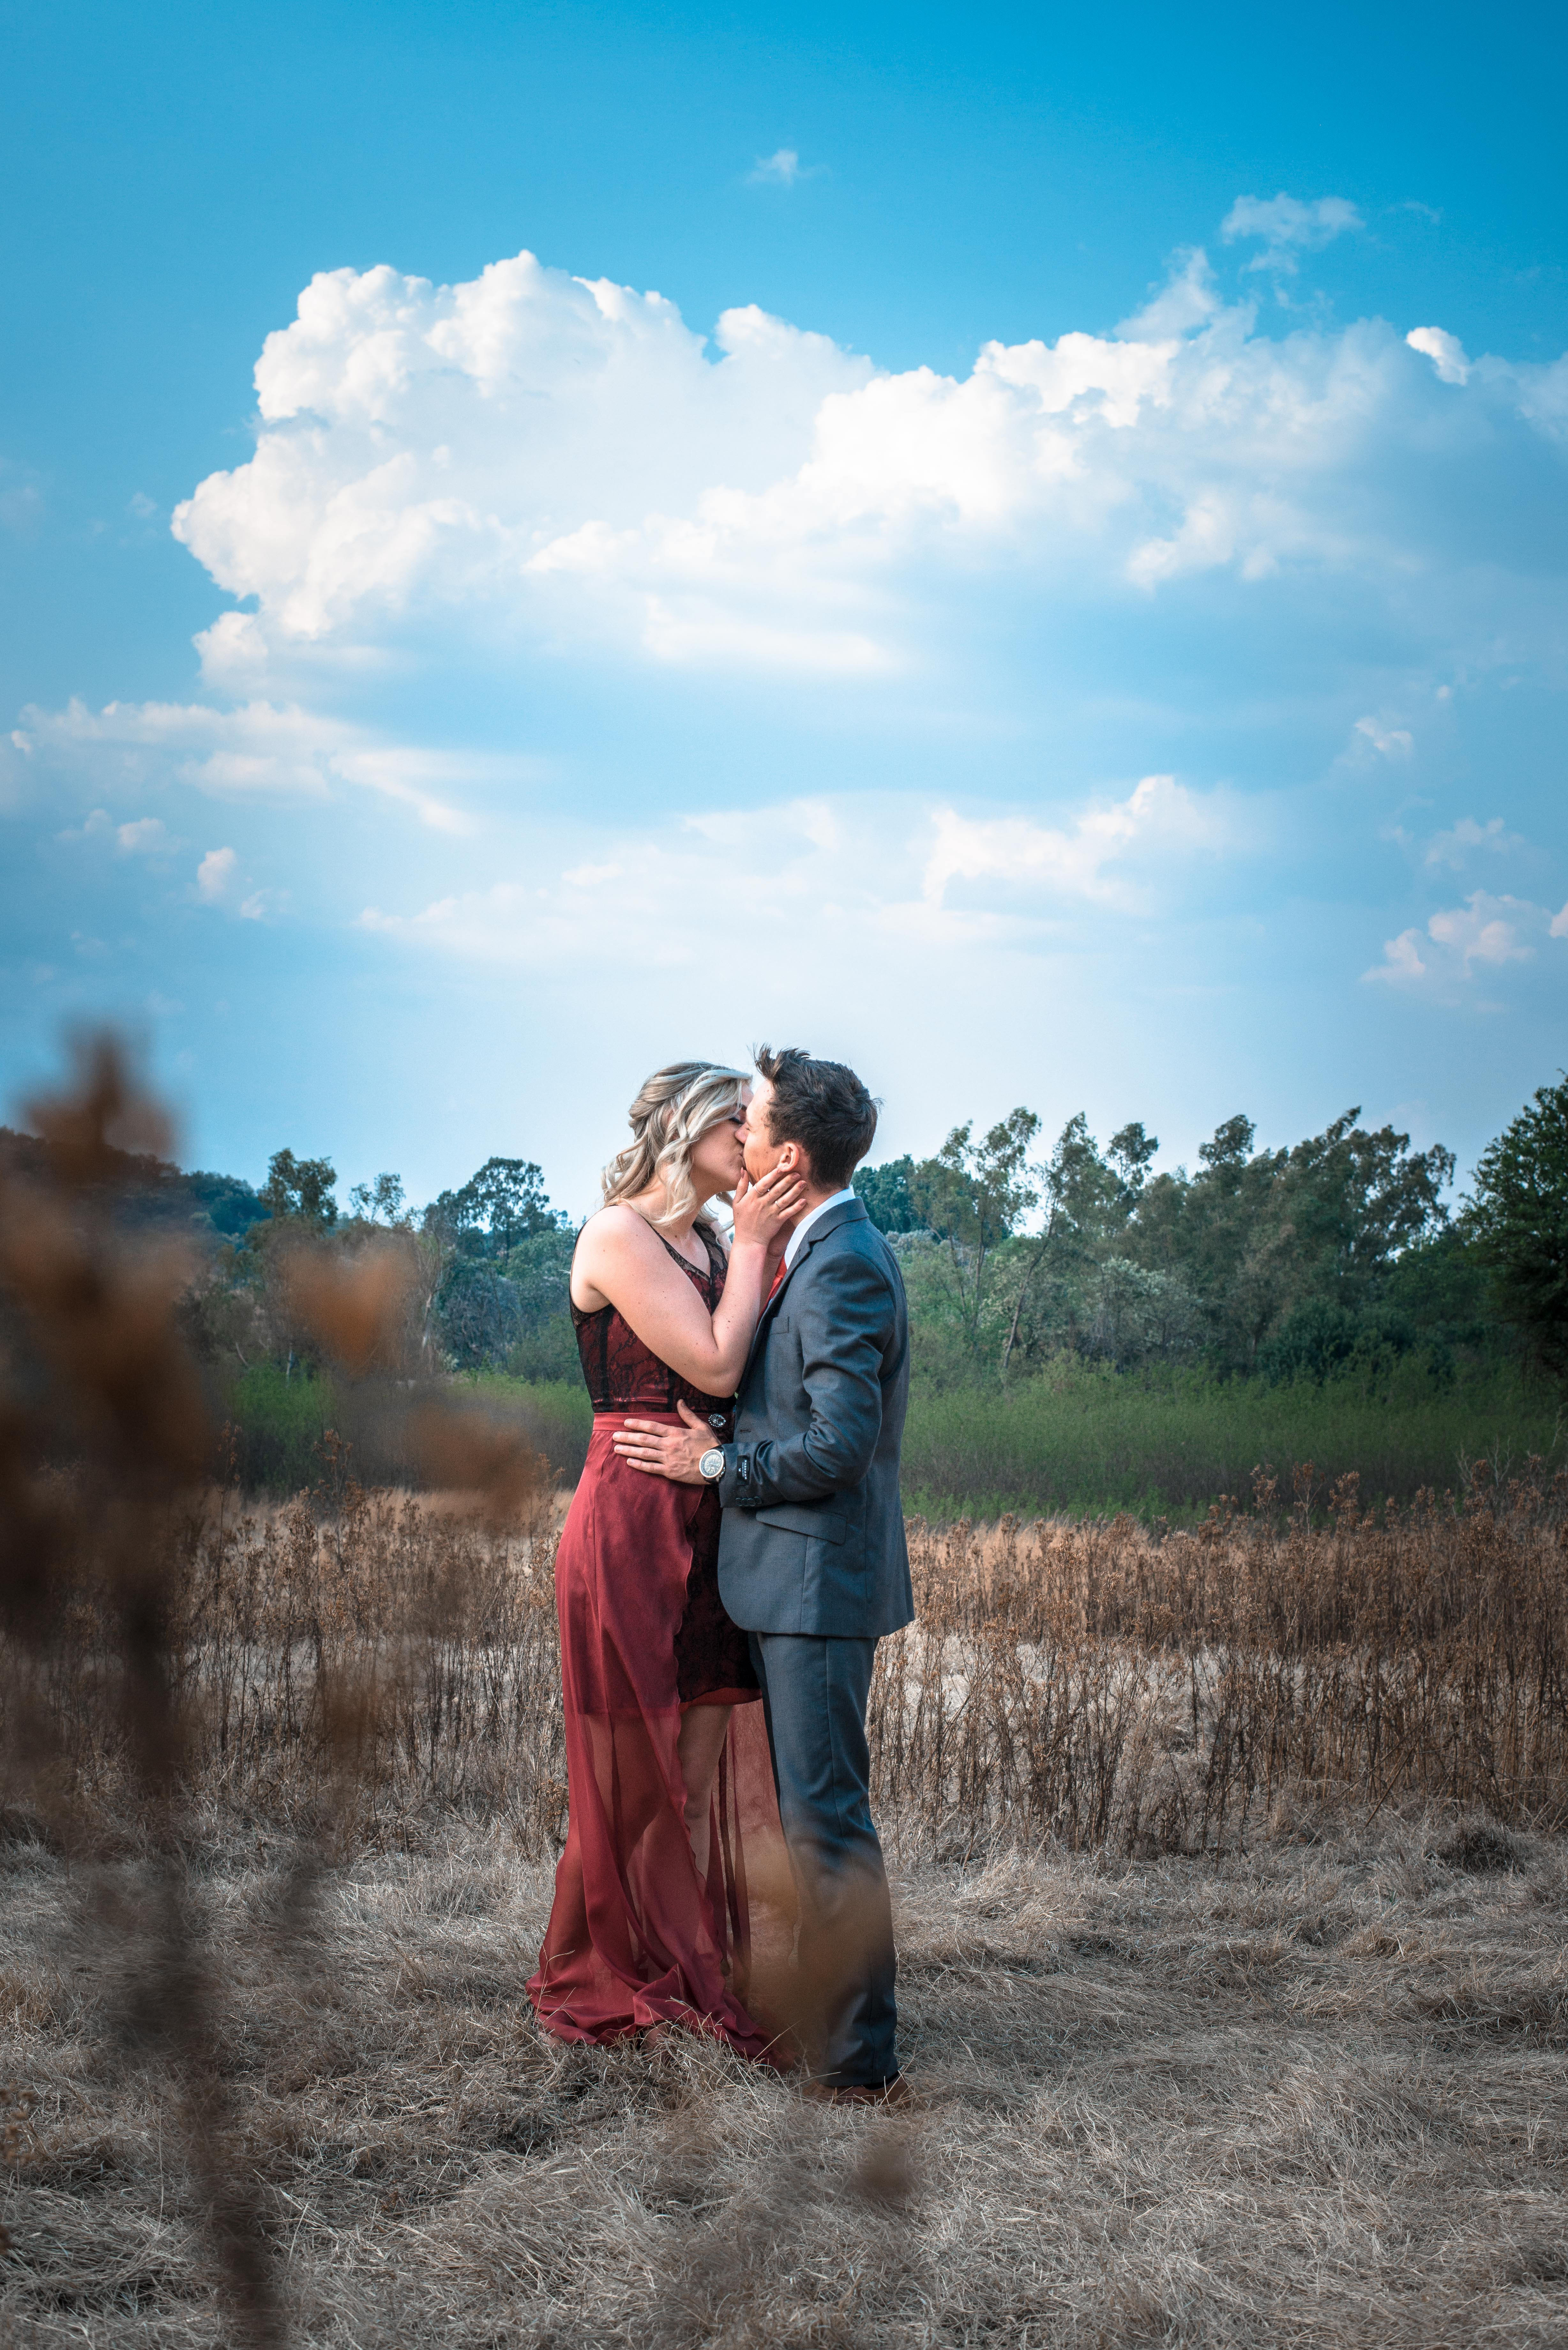 100 Great Kissing Photos  Pexels  Free Stock Photos-3881